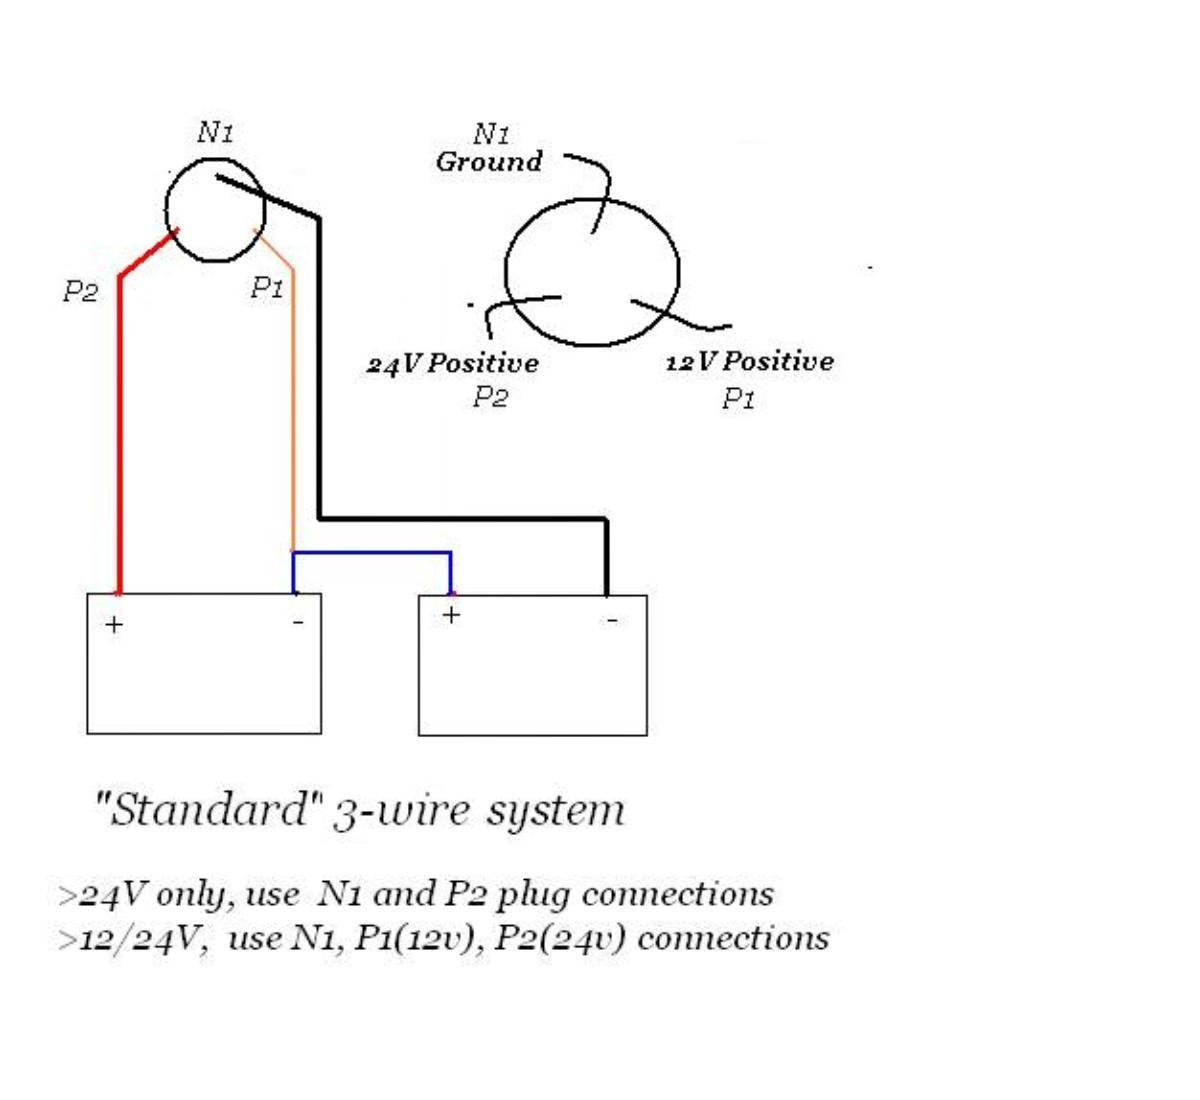 100 Trolling Motor Wiring Diagram - Wiring Diagrams - Minn Kota Trolling Motor Wiring Diagram